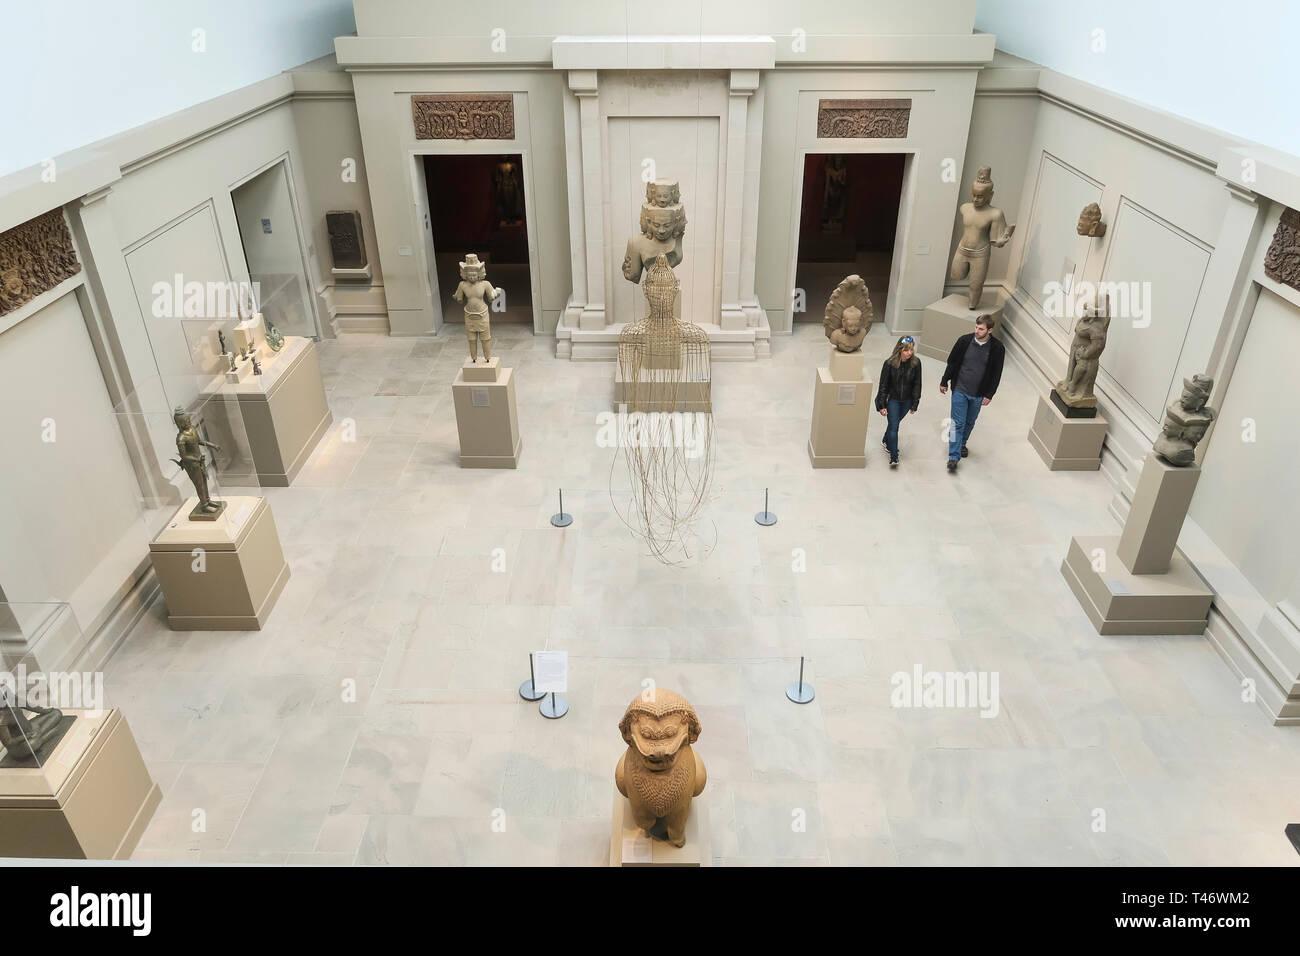 Asian Art Wing at the Metropolitan Museum of Art in New York City, USA - Stock Image